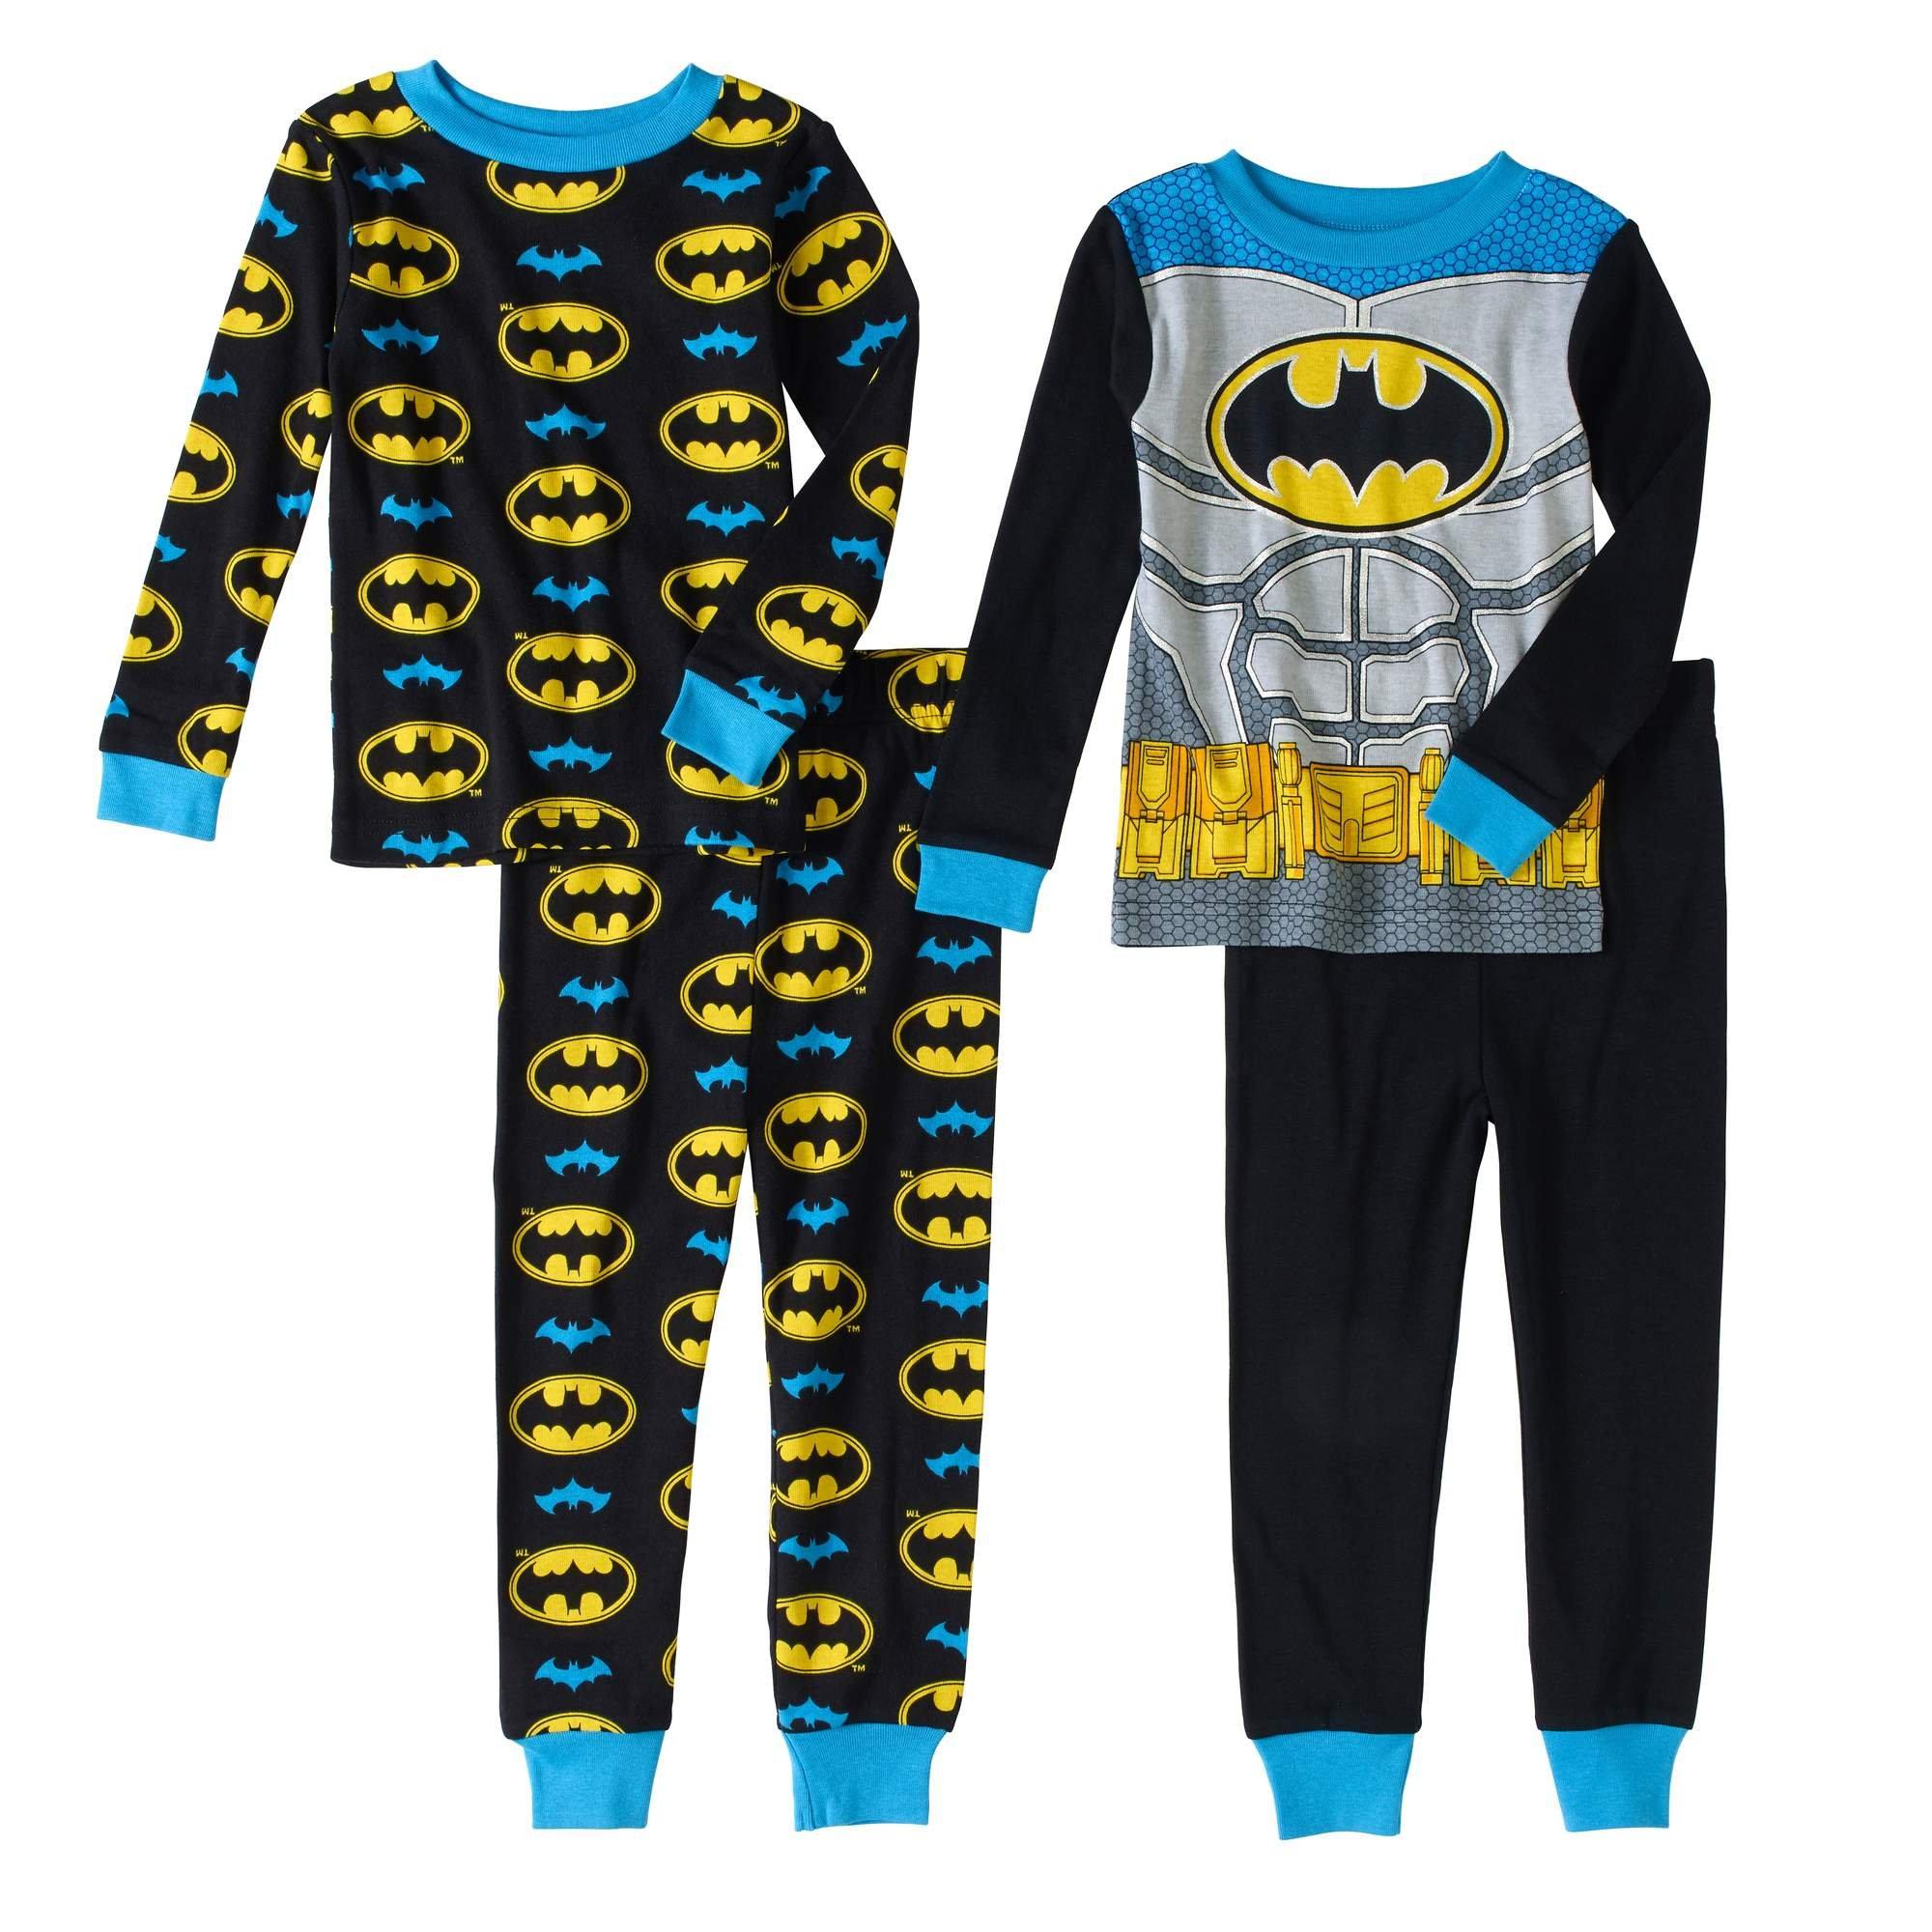 DC Comics Batman 4 PC Long Sleeve Tight Fit Cotton Pajama Set Boy Size 5T